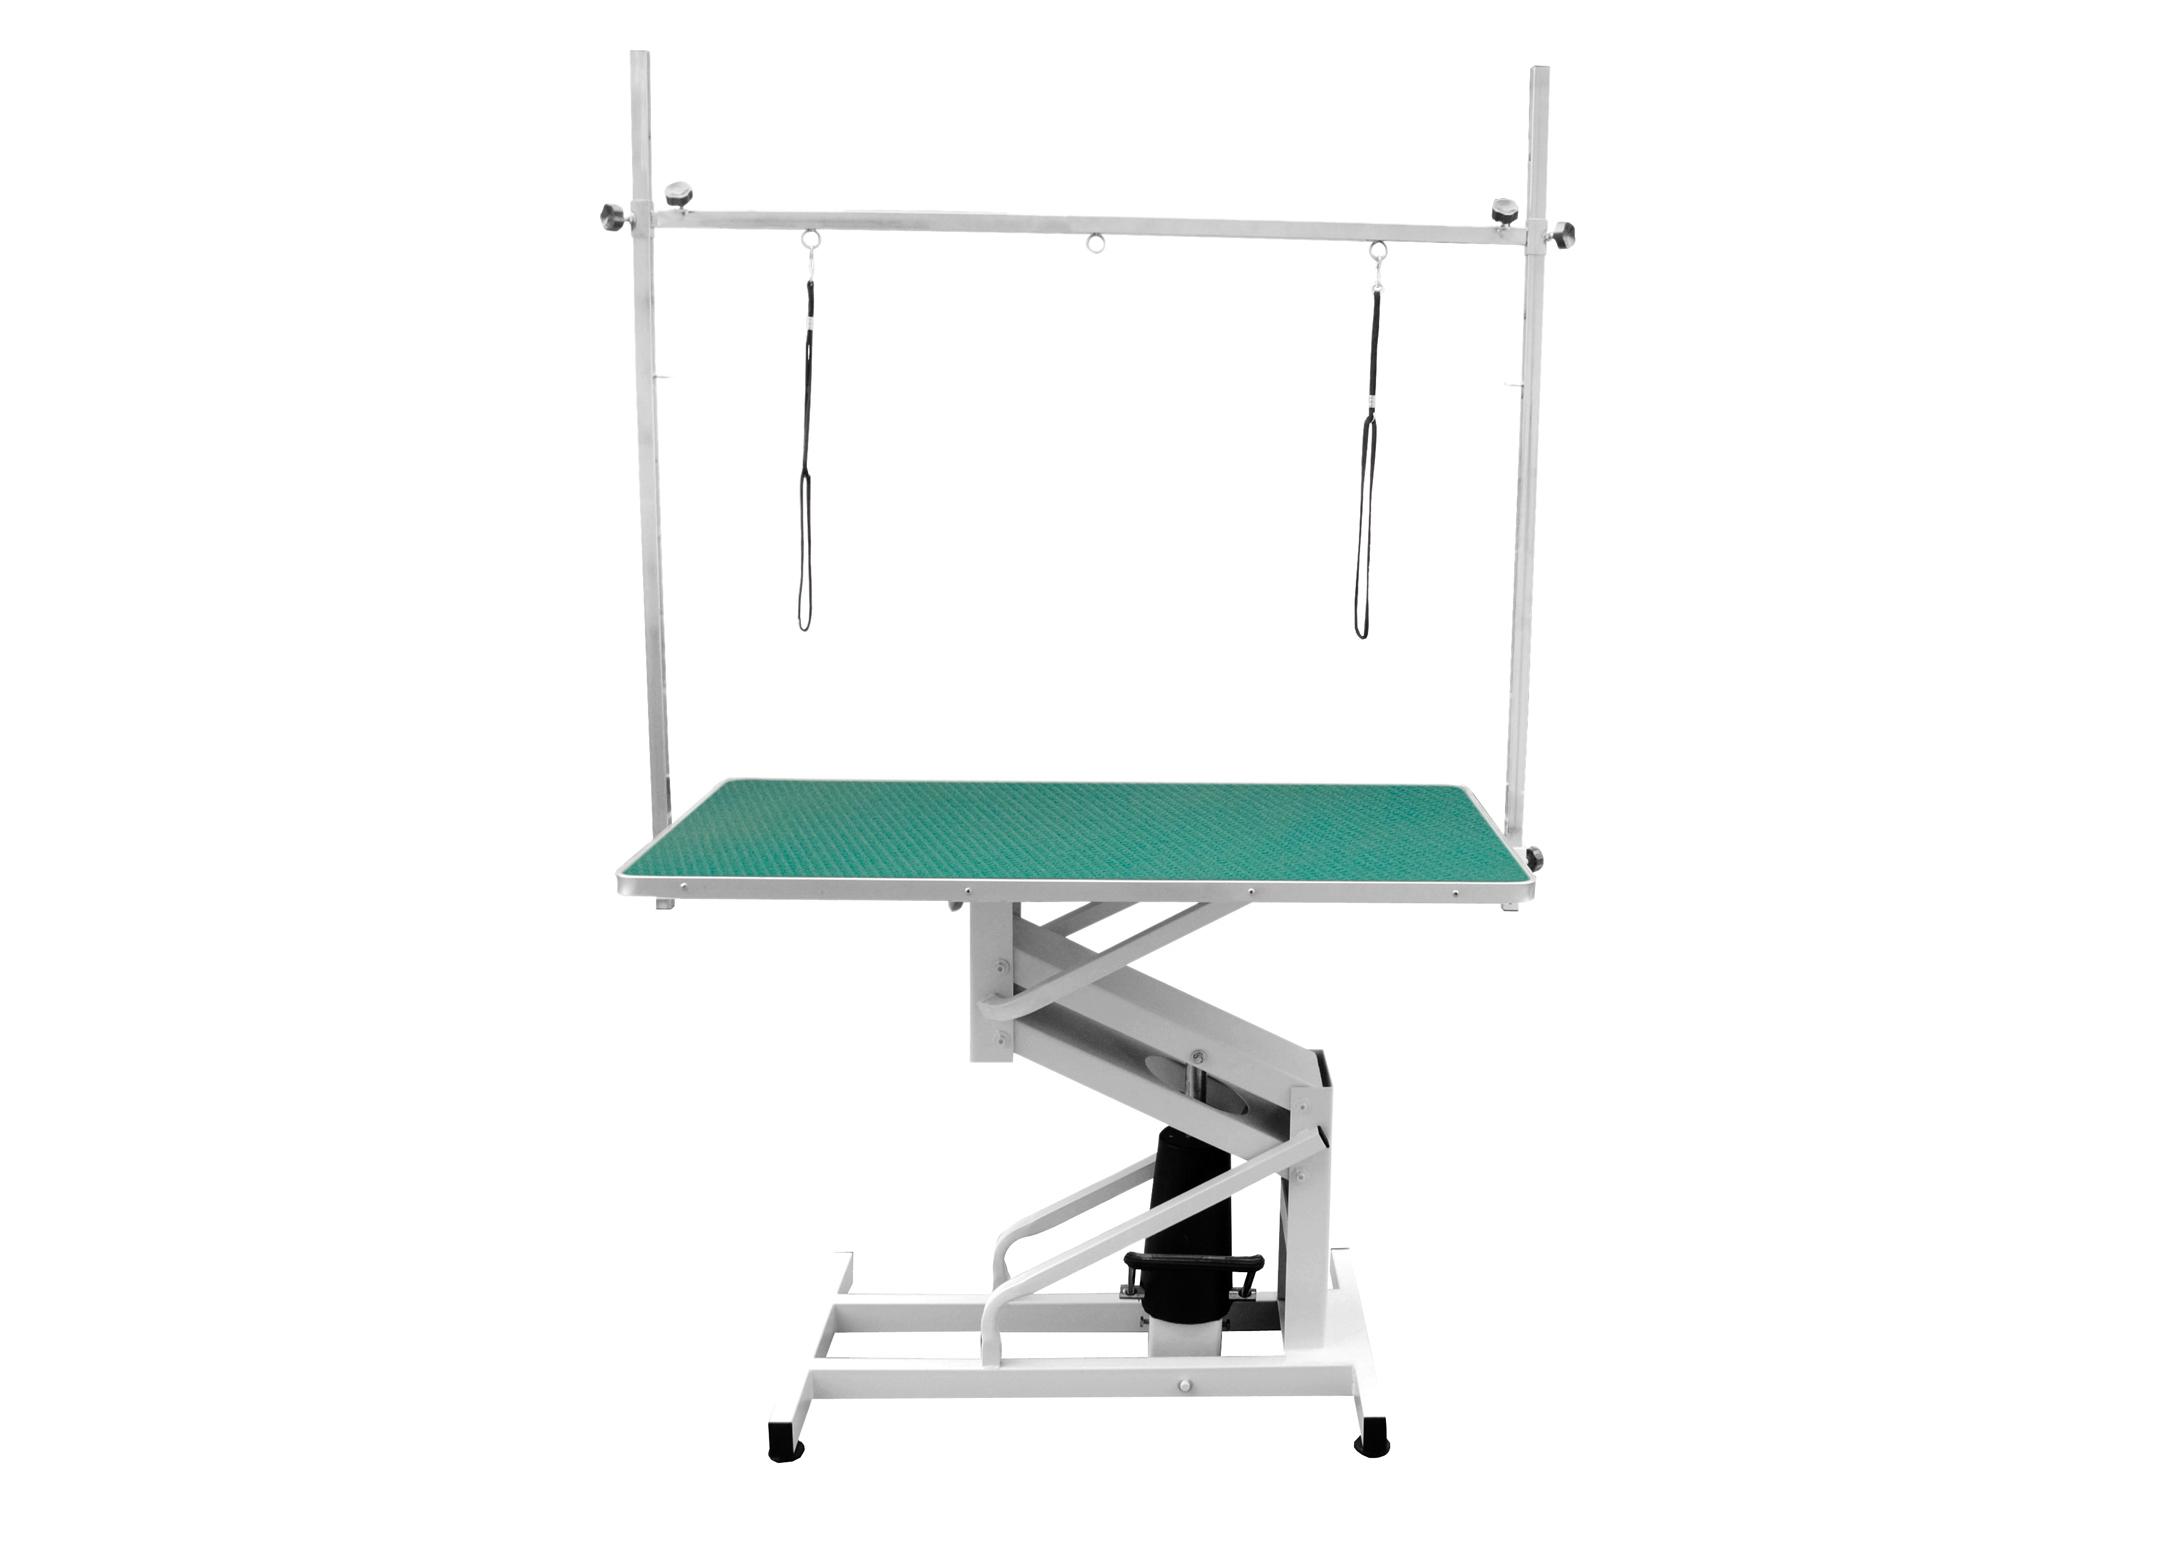 Groom-X Hydraulic Table Green 110x60x50-97cm Professional Grooming Table